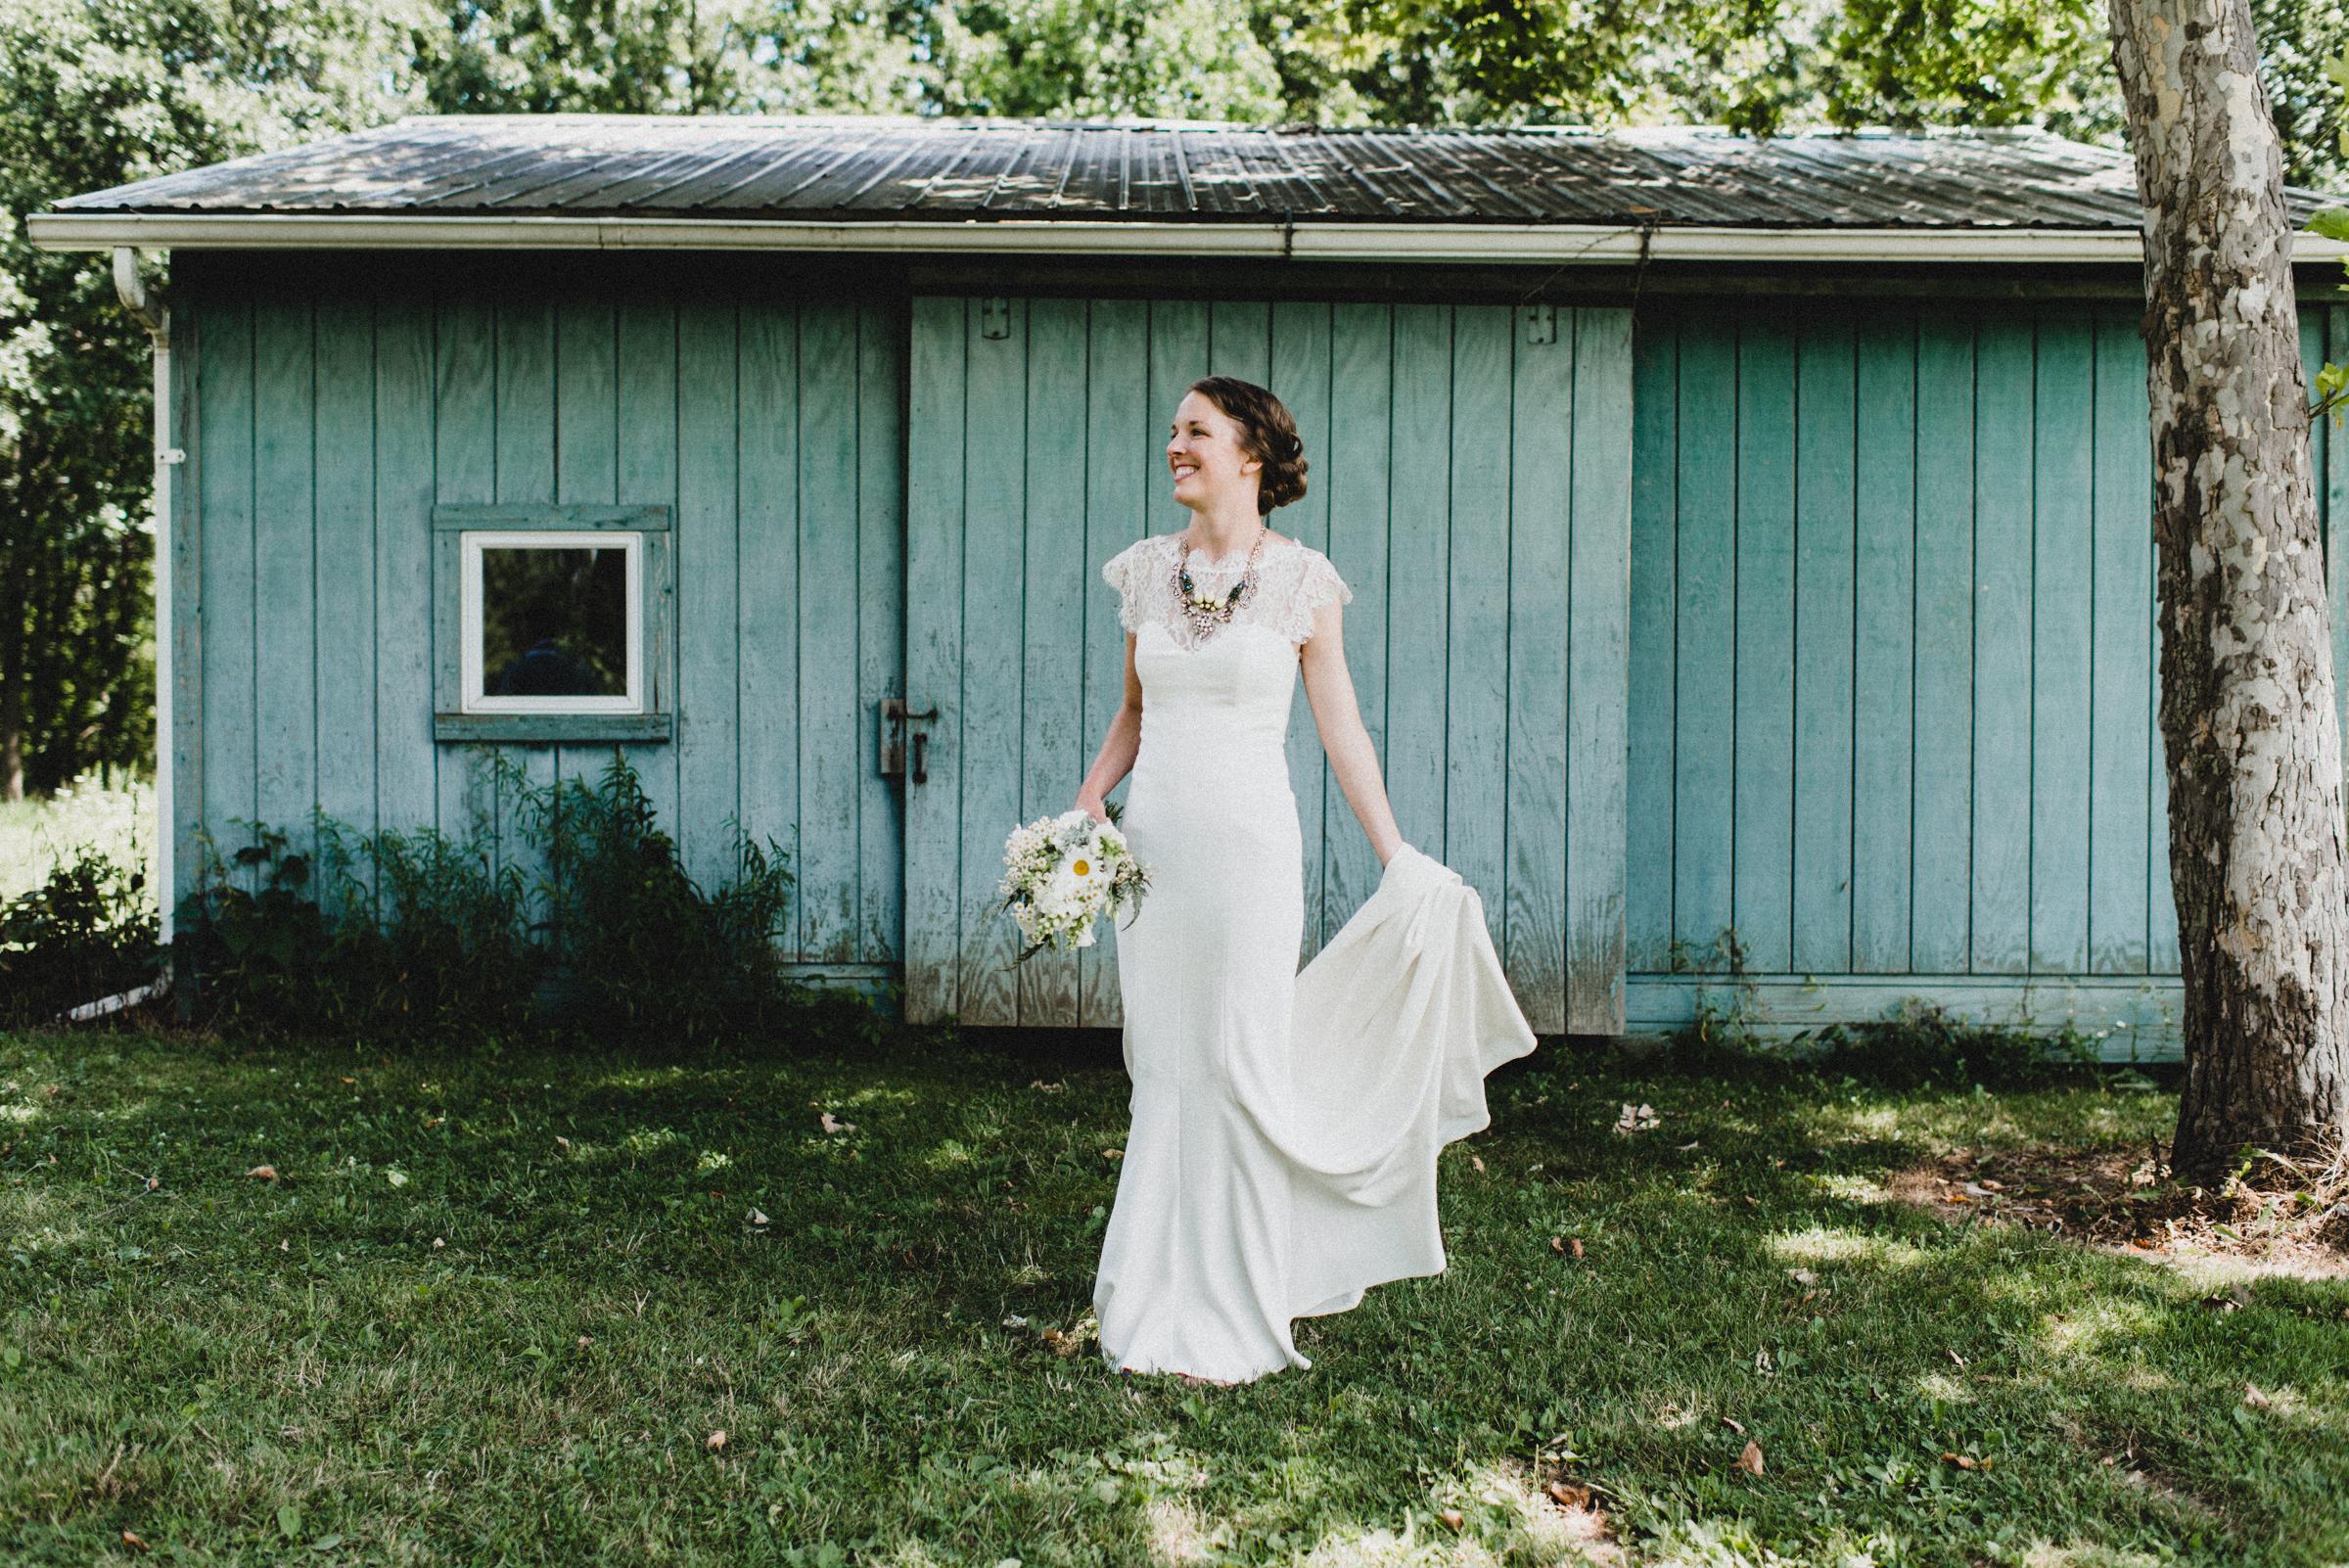 Intimate-Backyard-Farmhouse-Ohio-Wedding-Andi+Ben_Mallory+Justin-Photographers-136.JPG